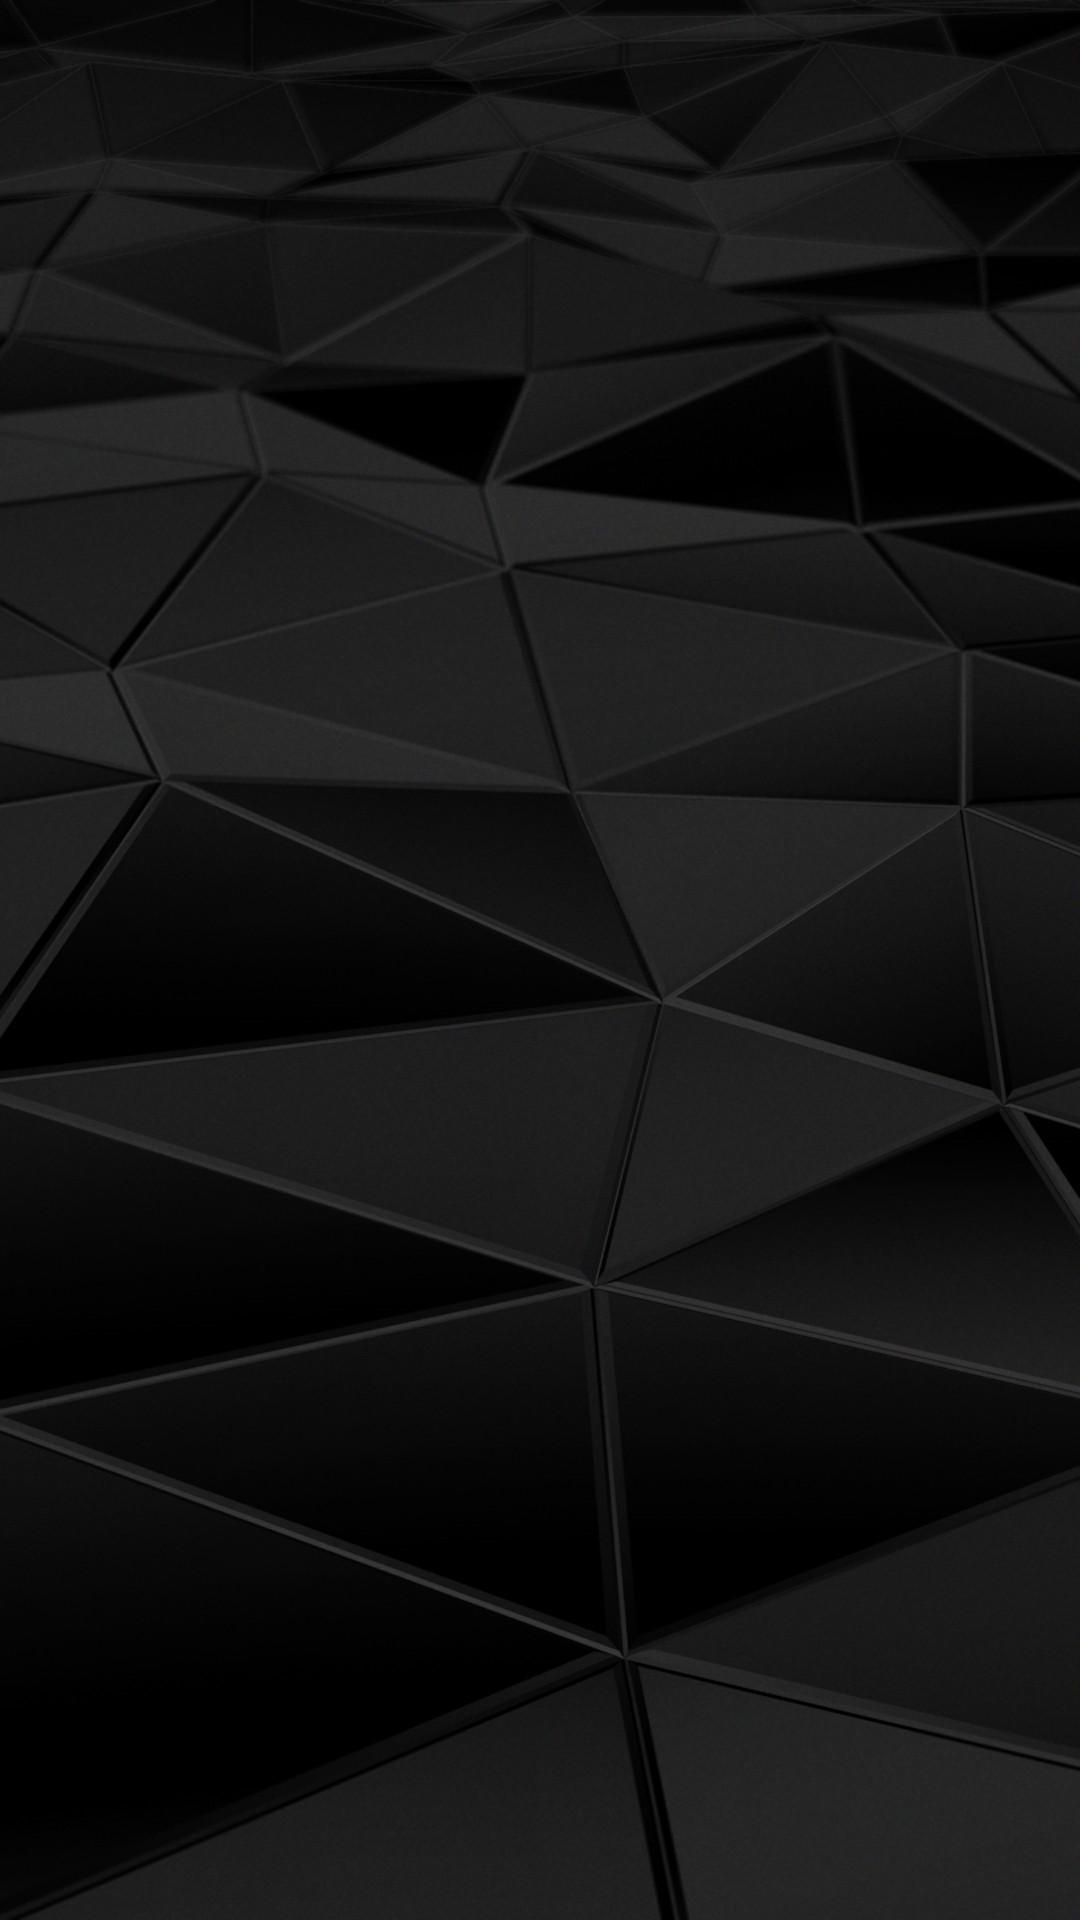 HD Mobile Wallpapers (1080x1920) - Album on Imgur